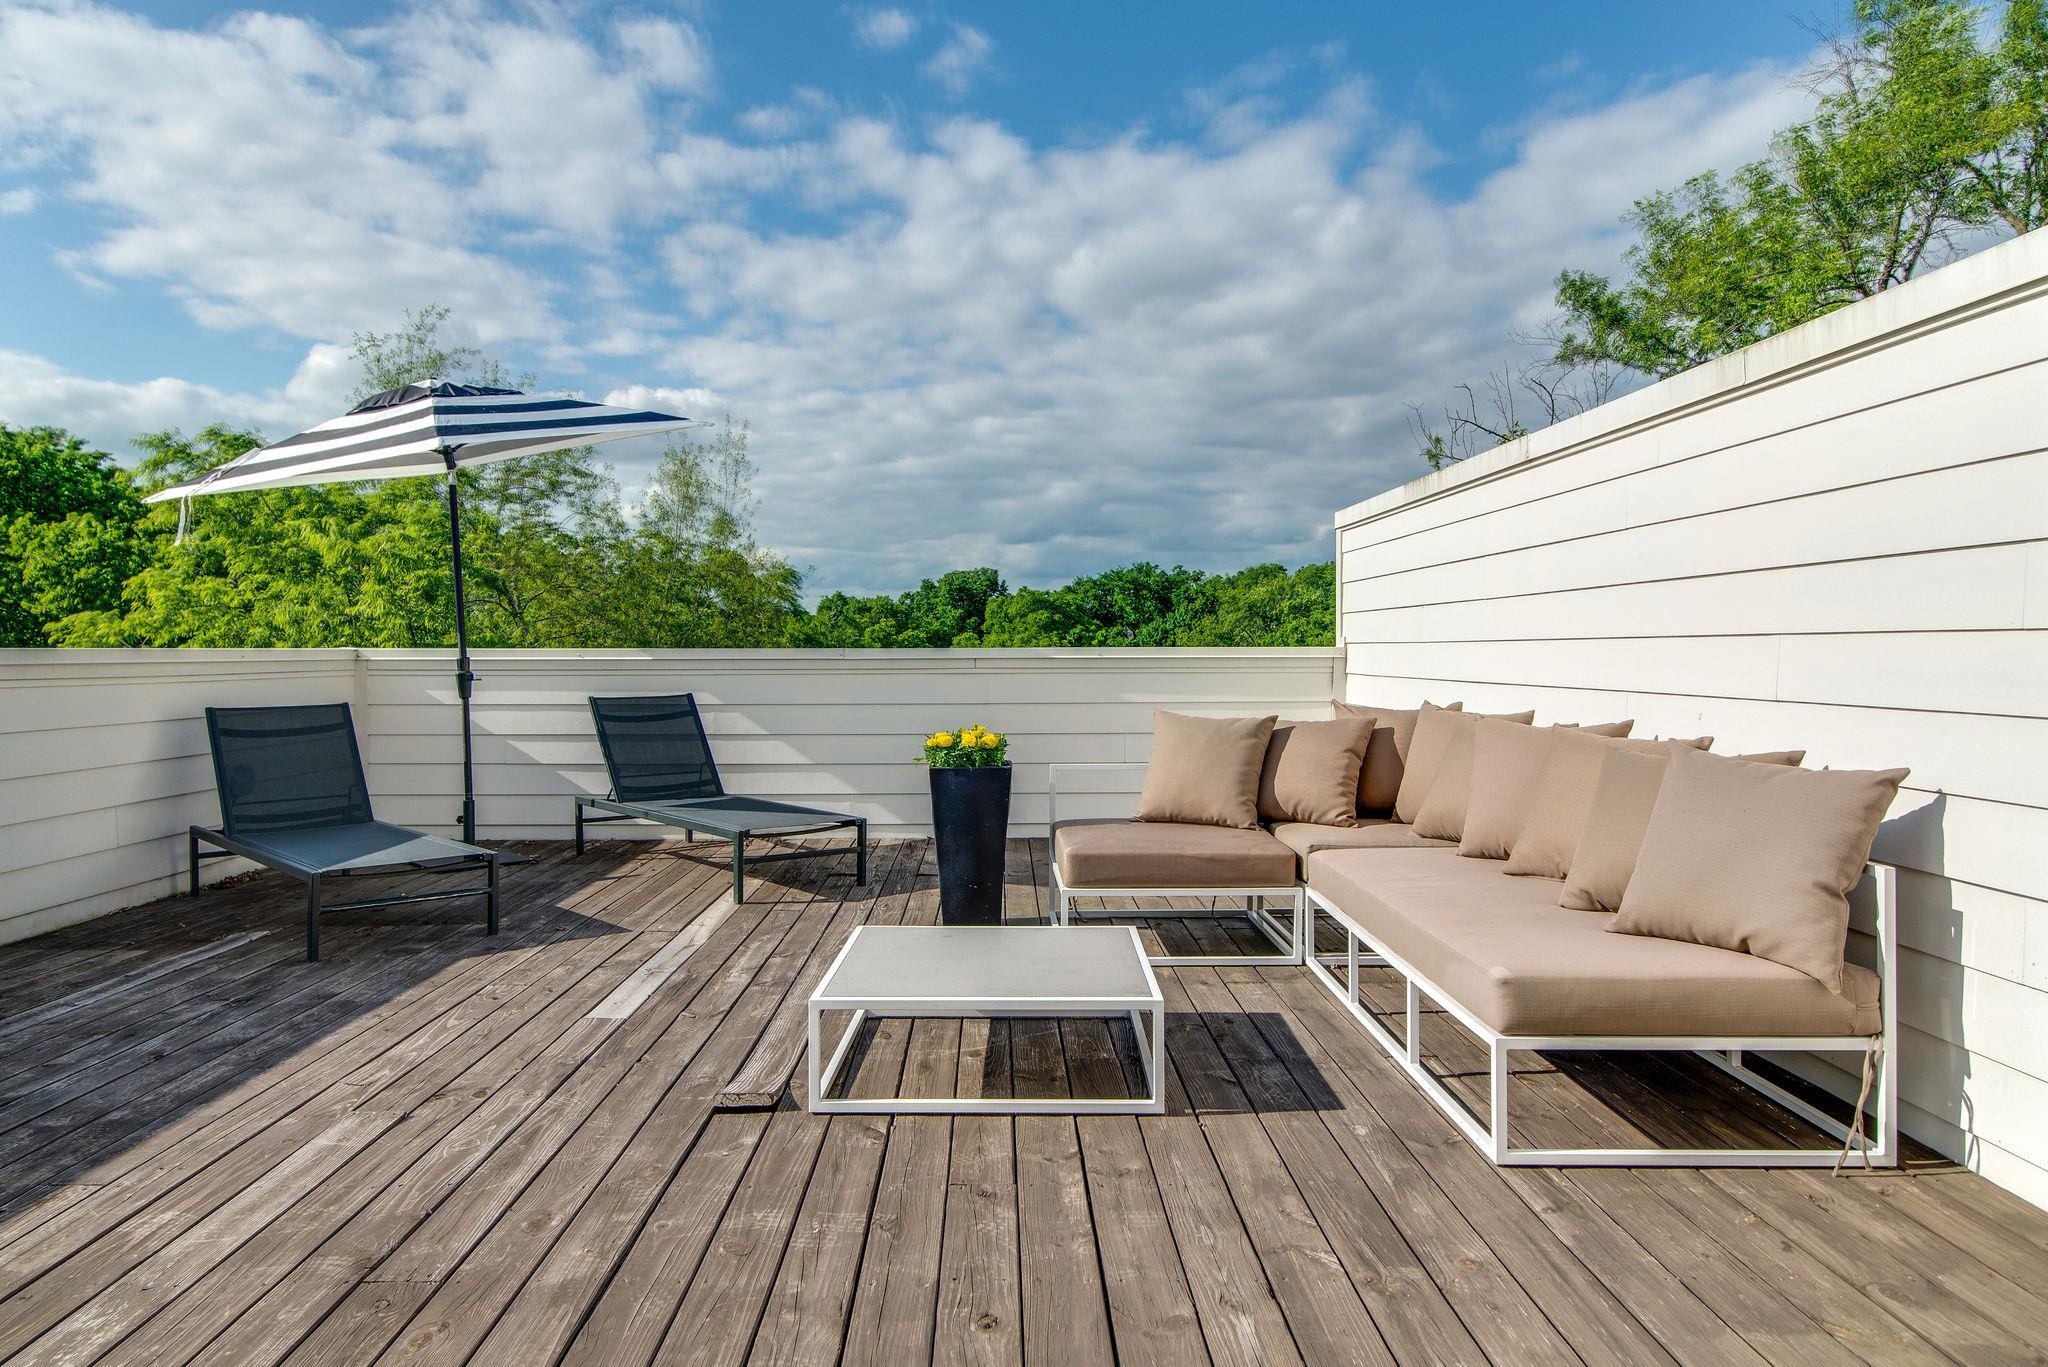 1503 Shelby Ave #A Property Photo - Nashville, TN real estate listing